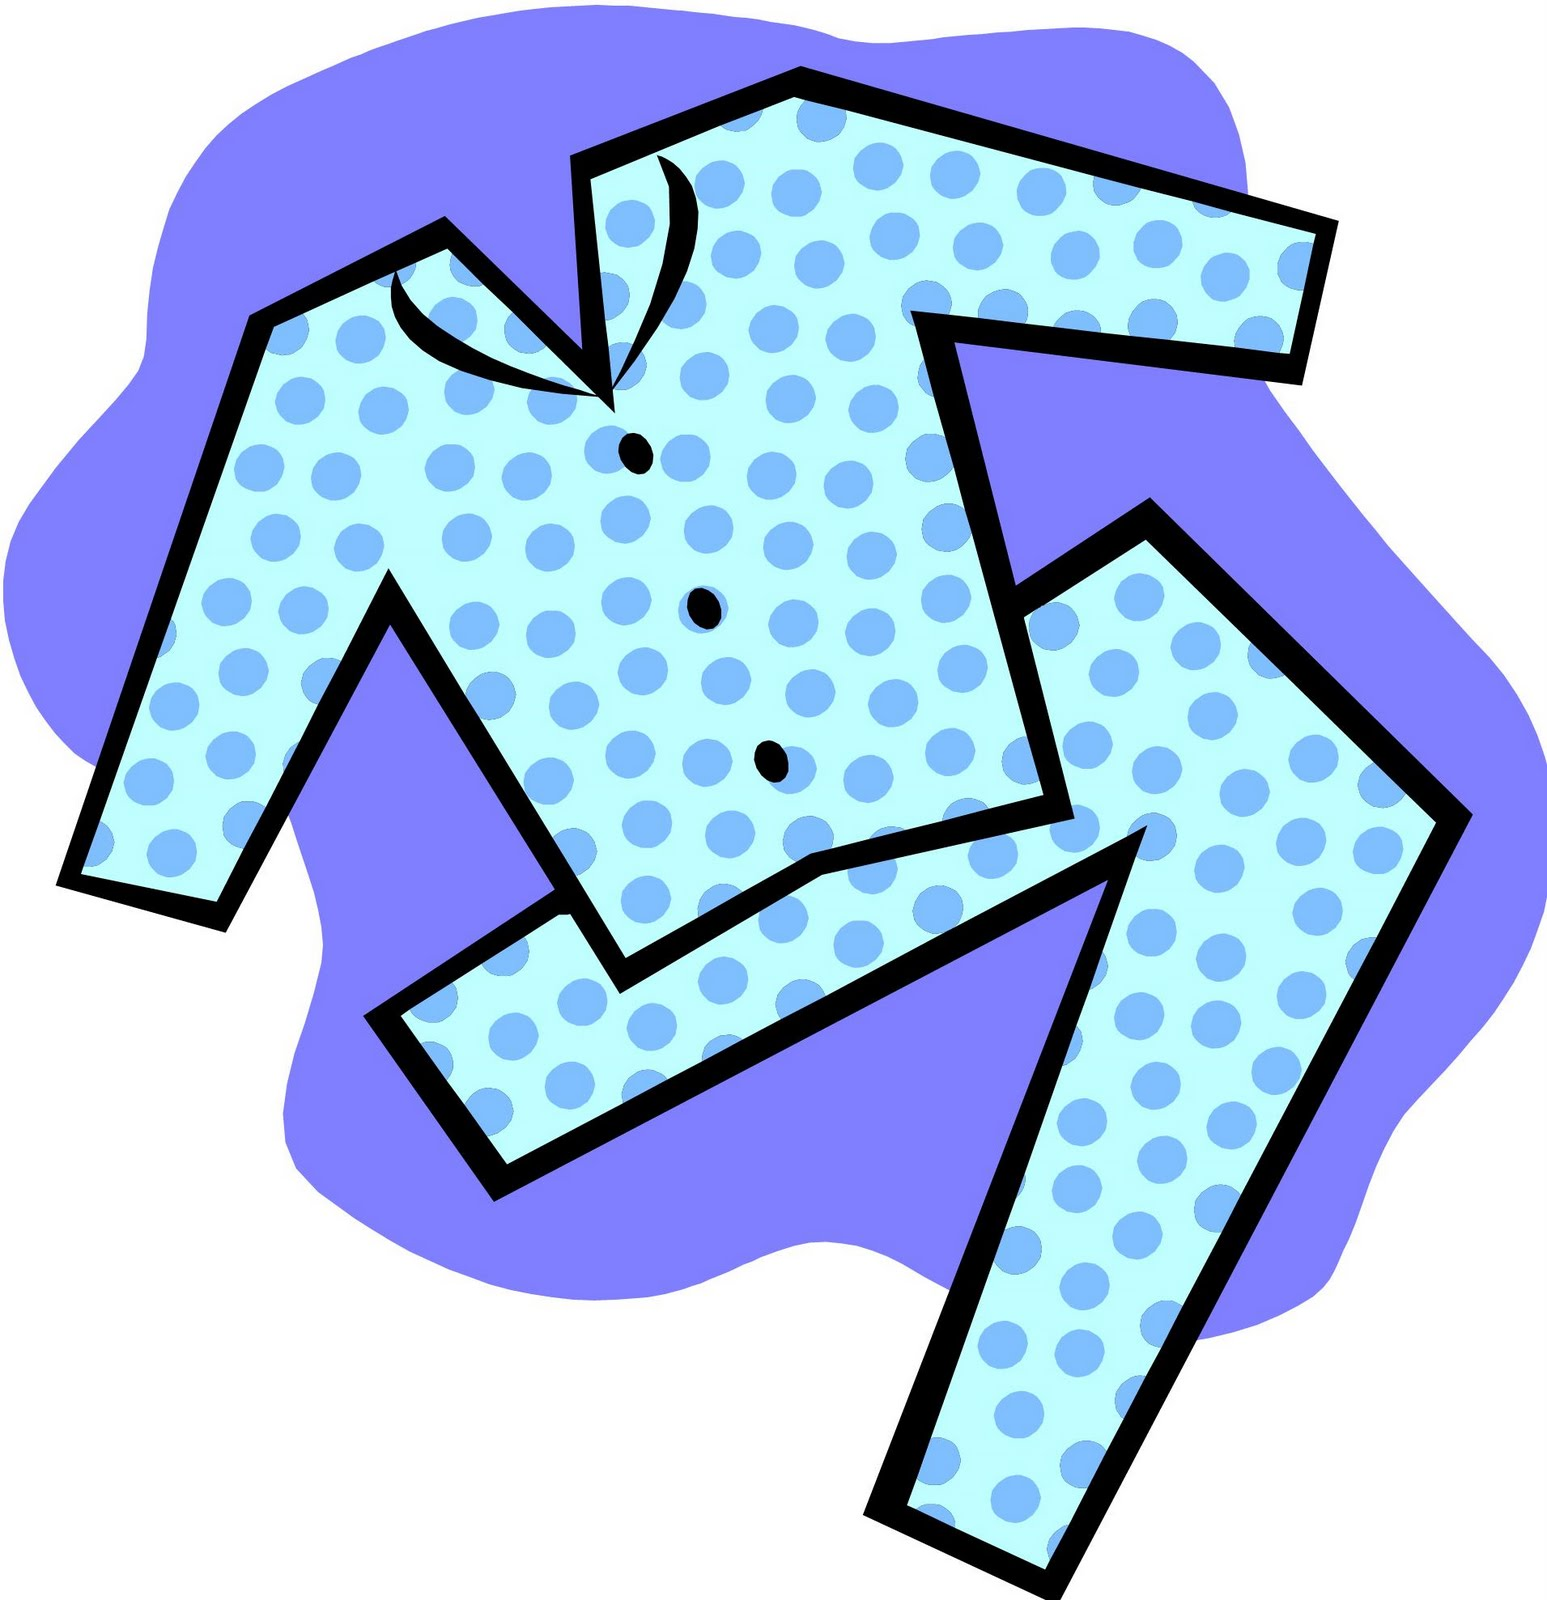 Pajama Cartoon Clipart - Clipart Kid